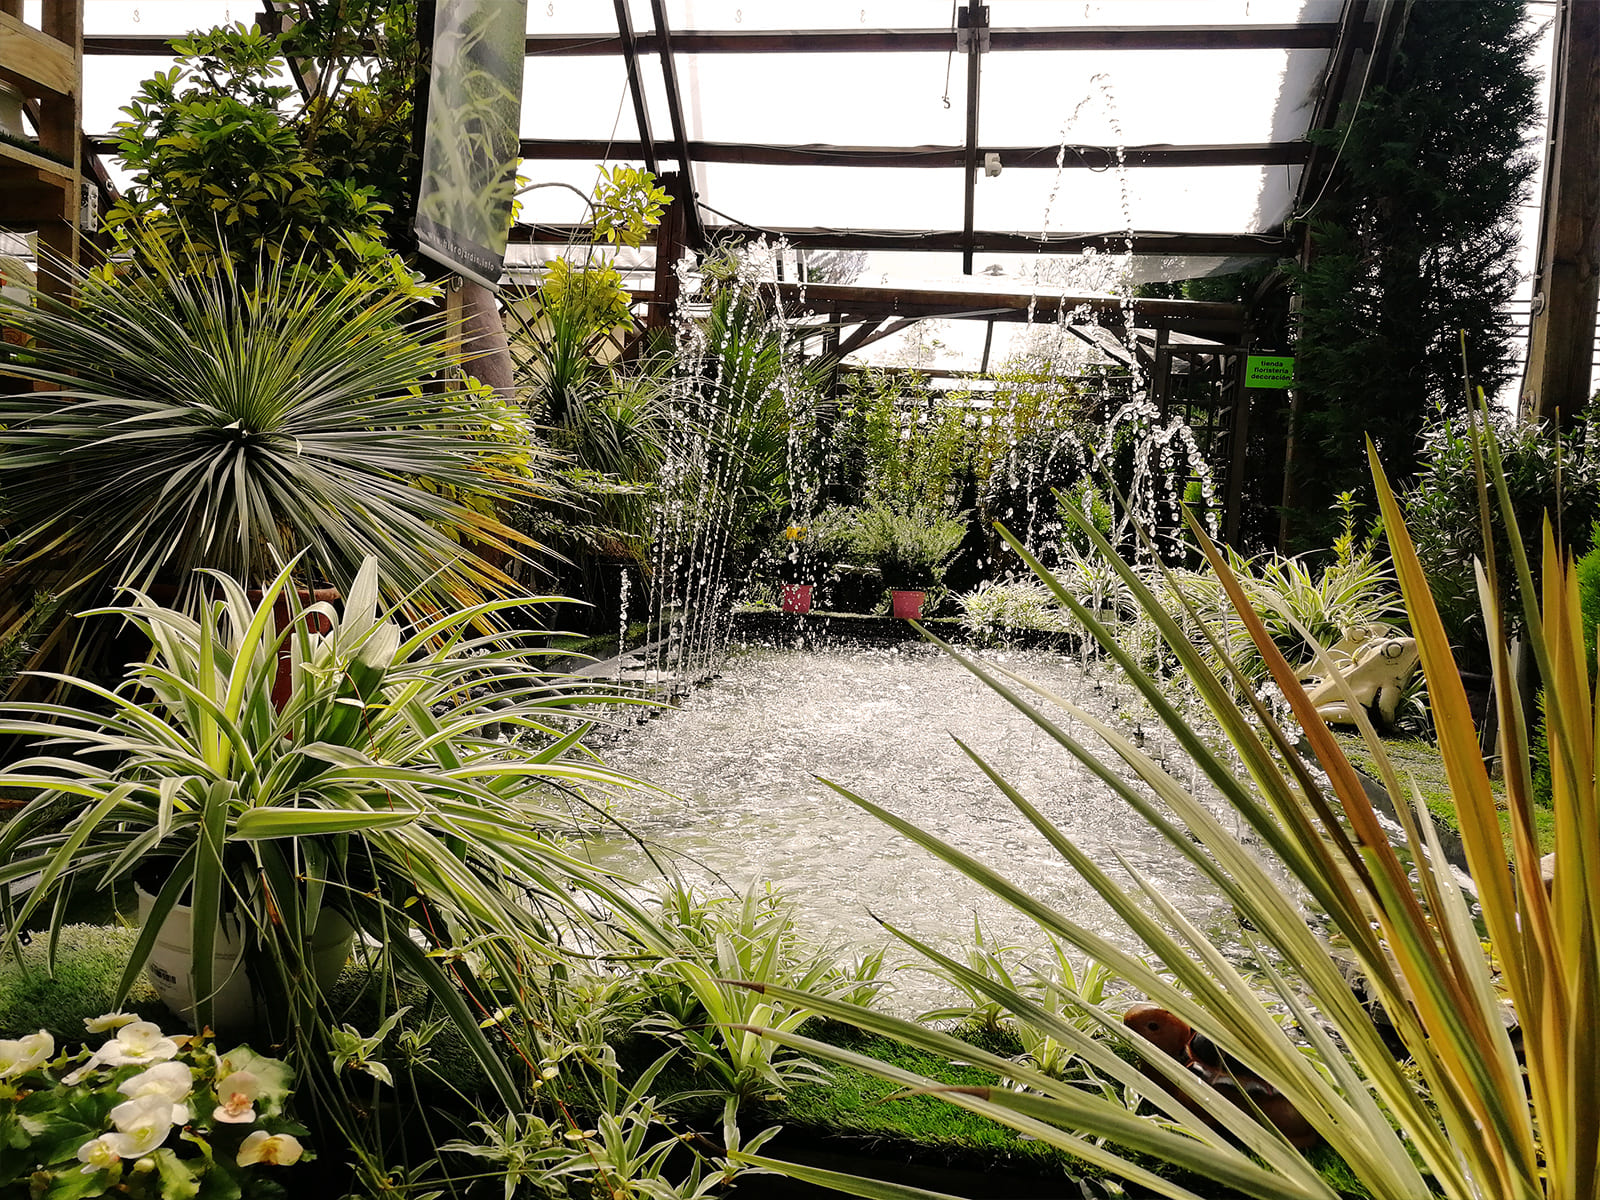 centro-jardineria-garden-invernadero-artesanal-madera-fuente-11_HIDROJARDIN-Bañeres